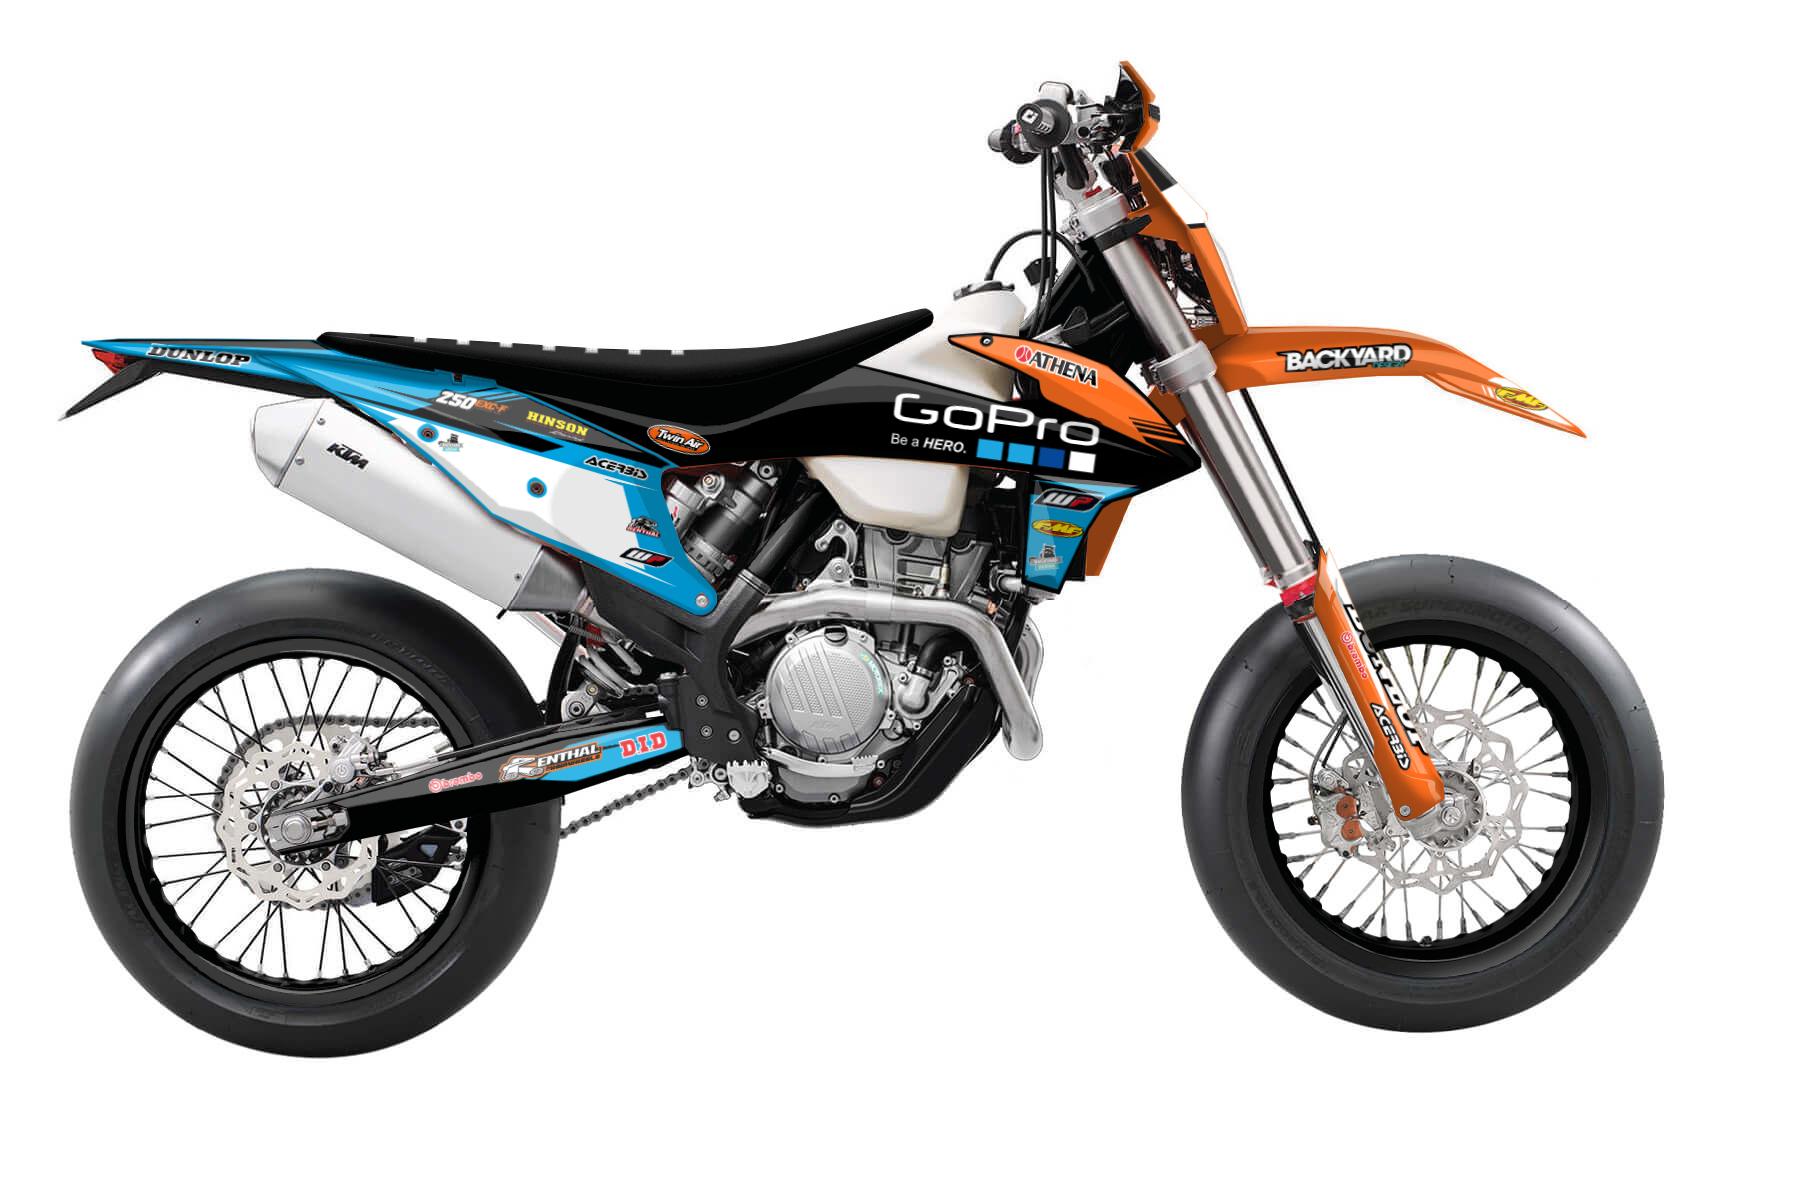 KTM EXC Dekor 2020-2022 - Factory Pro - Backyard Design